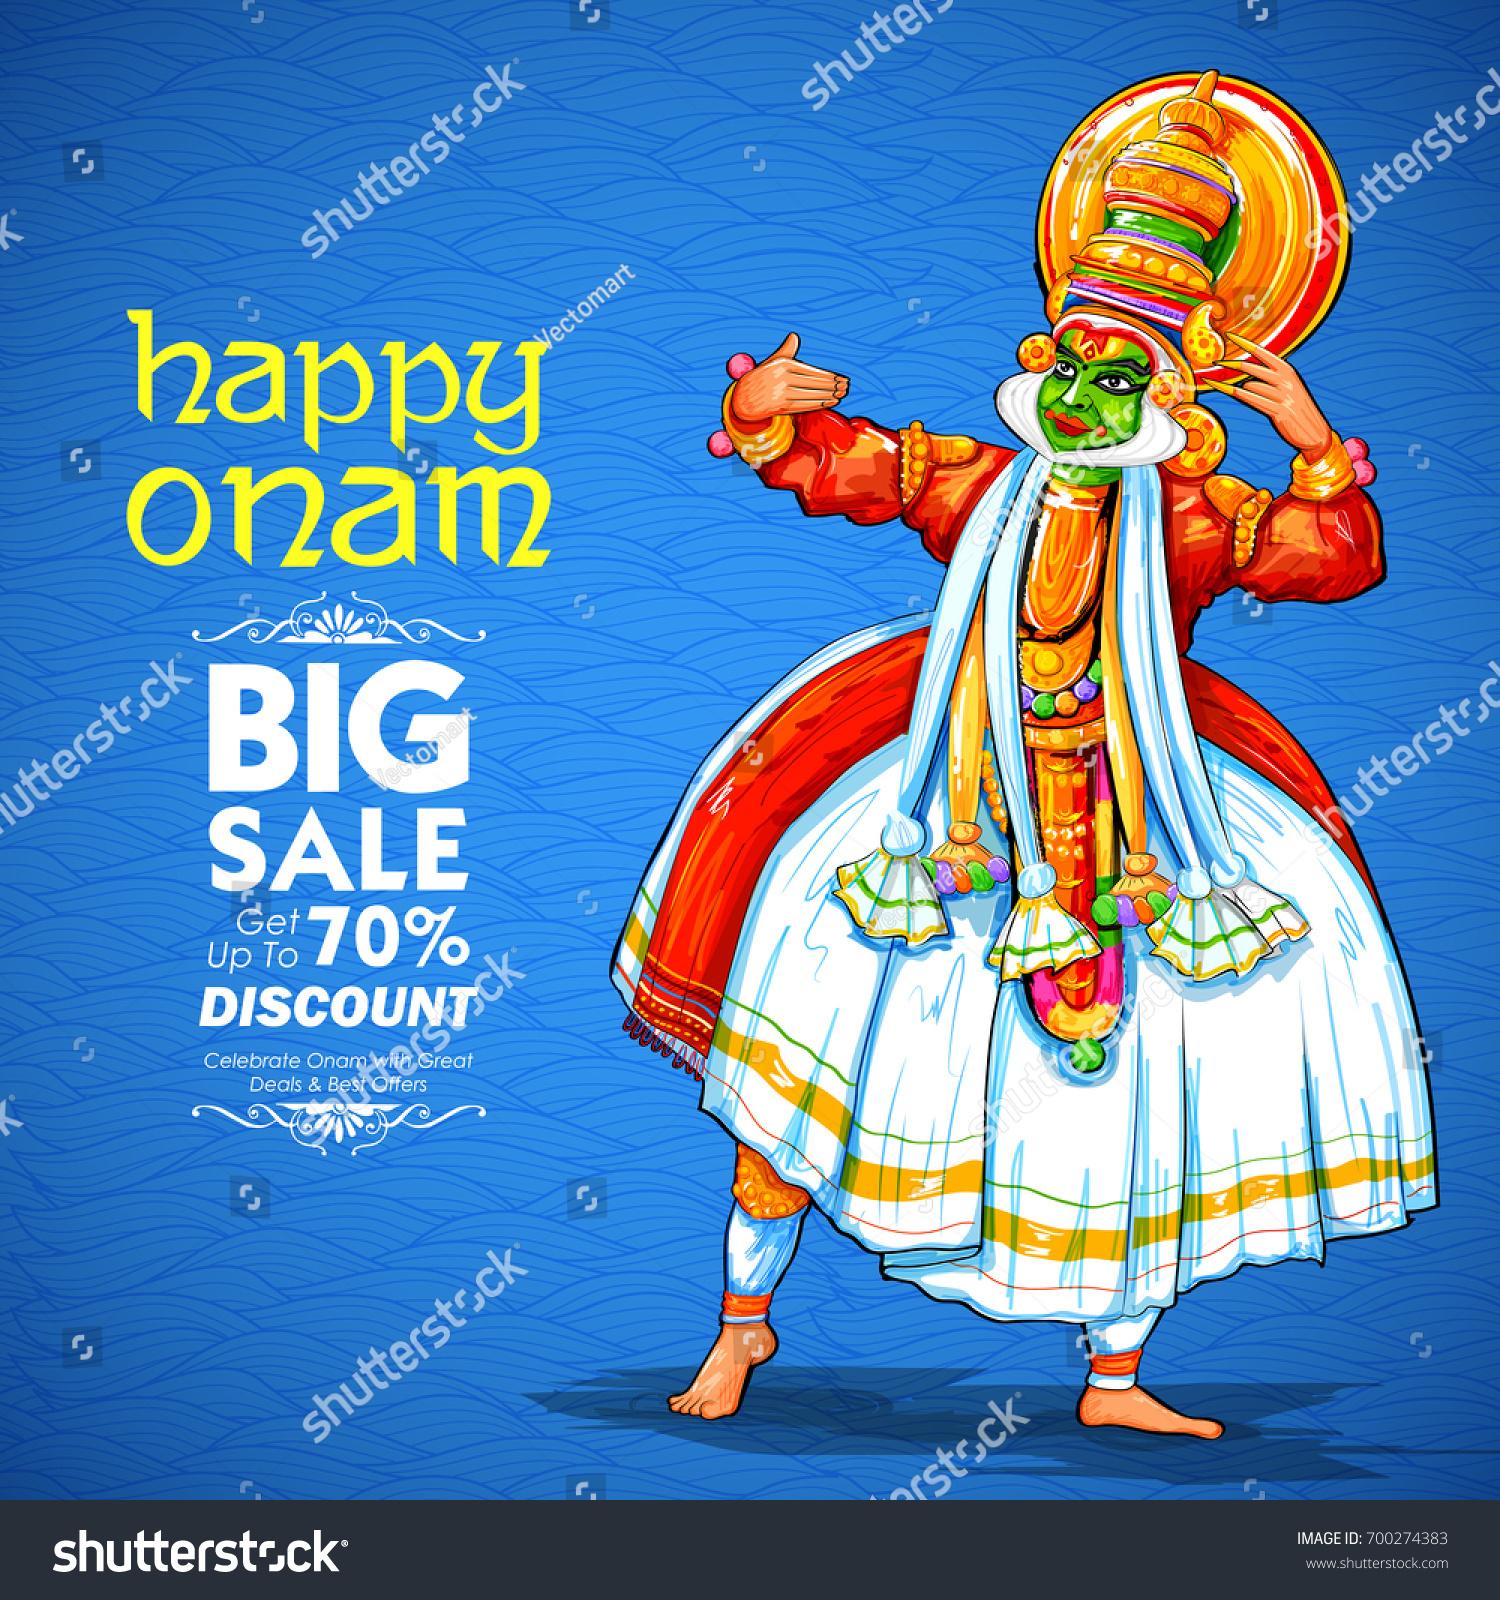 Illustration Colorful Kathakali Dancer On Advertisement